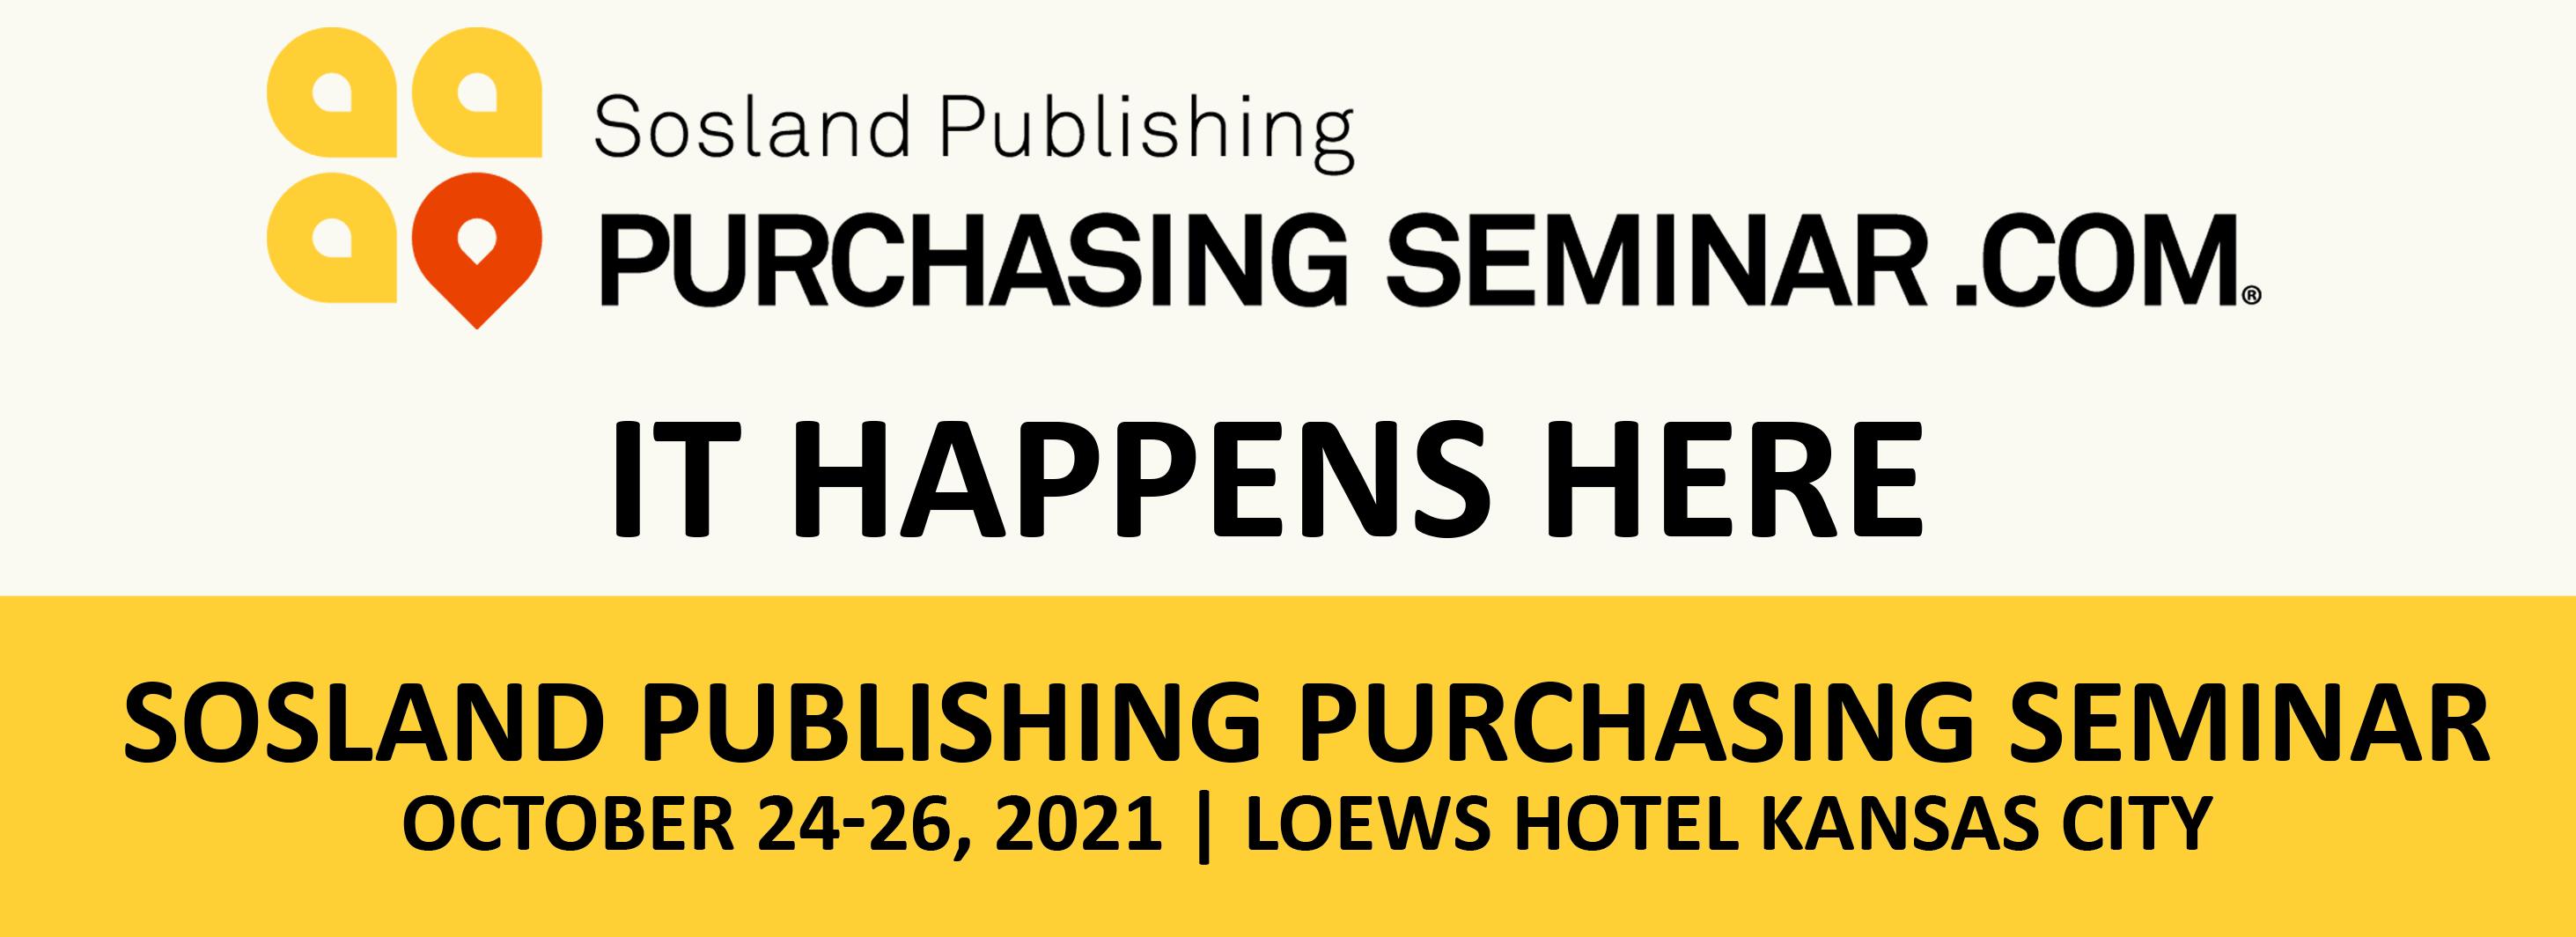 Sosland Publishing Purchasing Seminar - 44th Annual